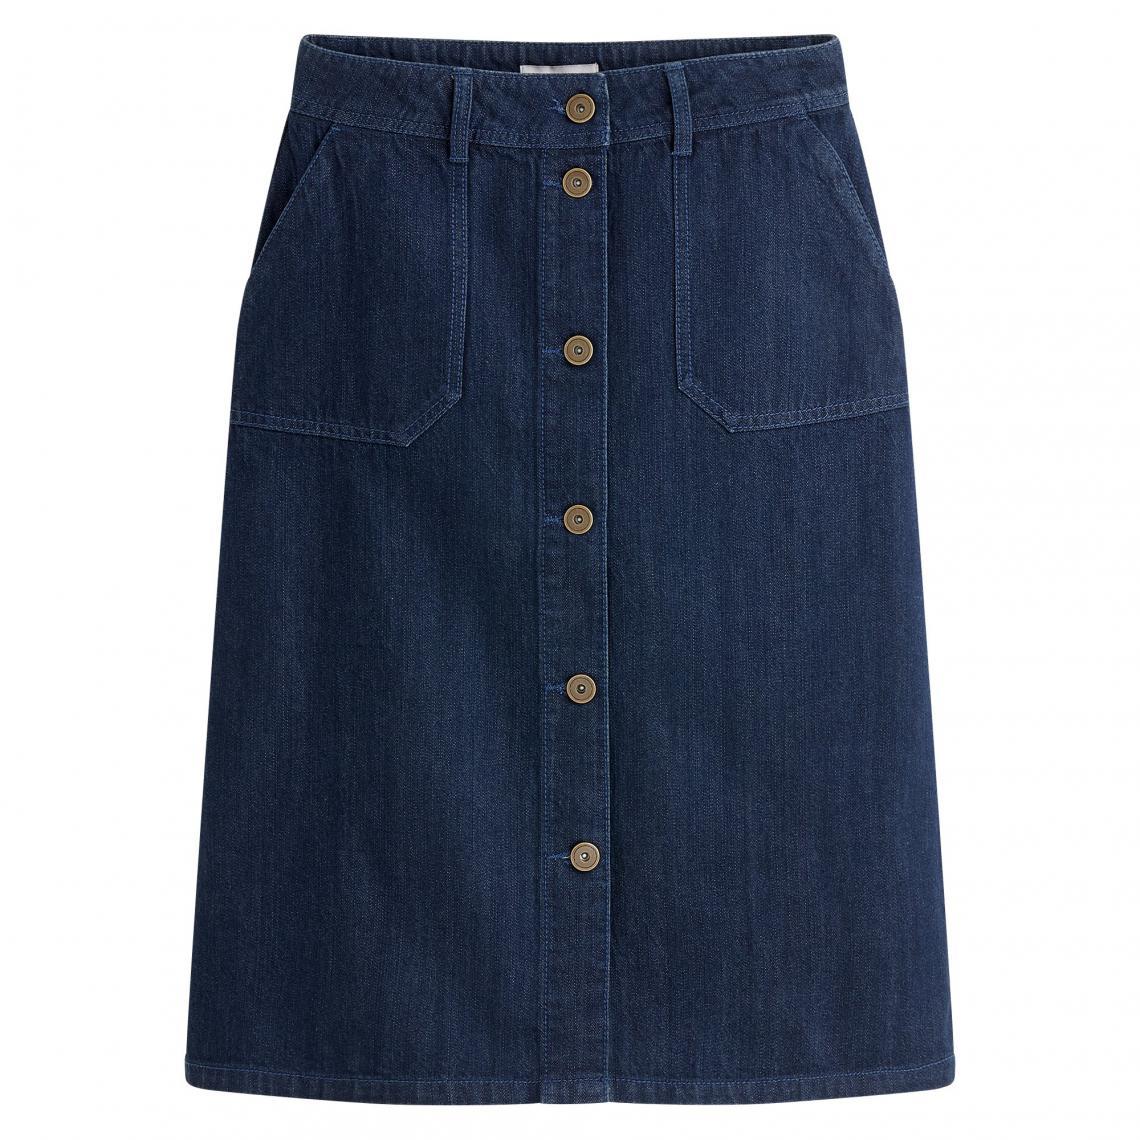 Next Jupe en jean blue Enfant